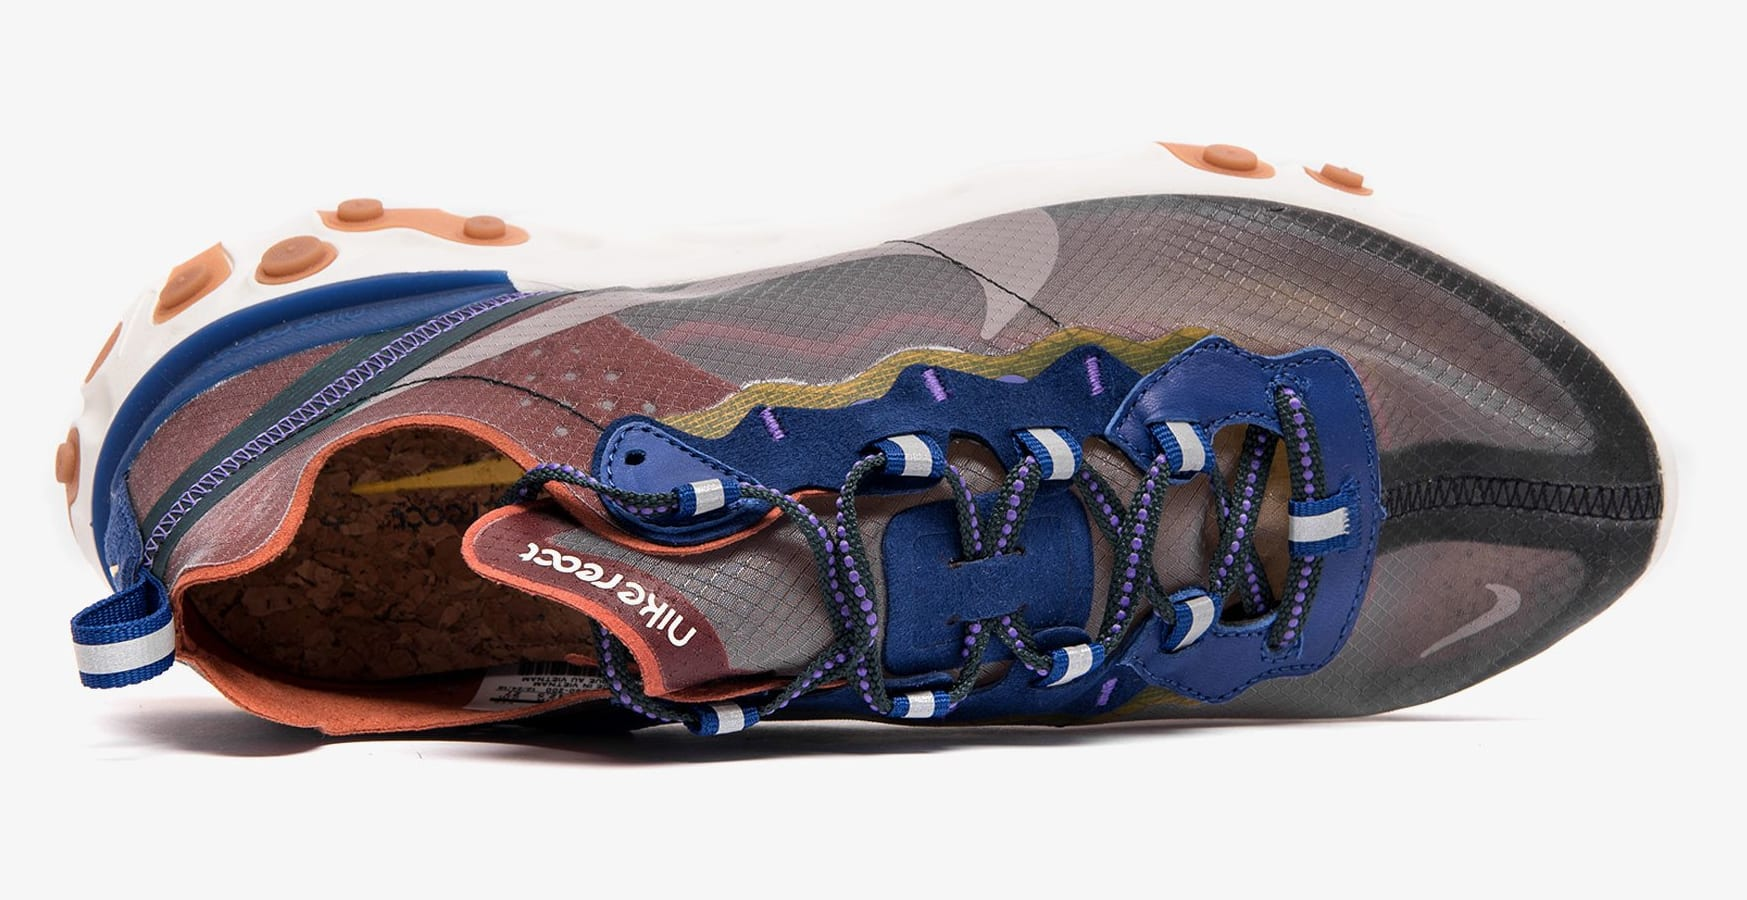 Nike React Element 87 AQ1090-200 (Top)